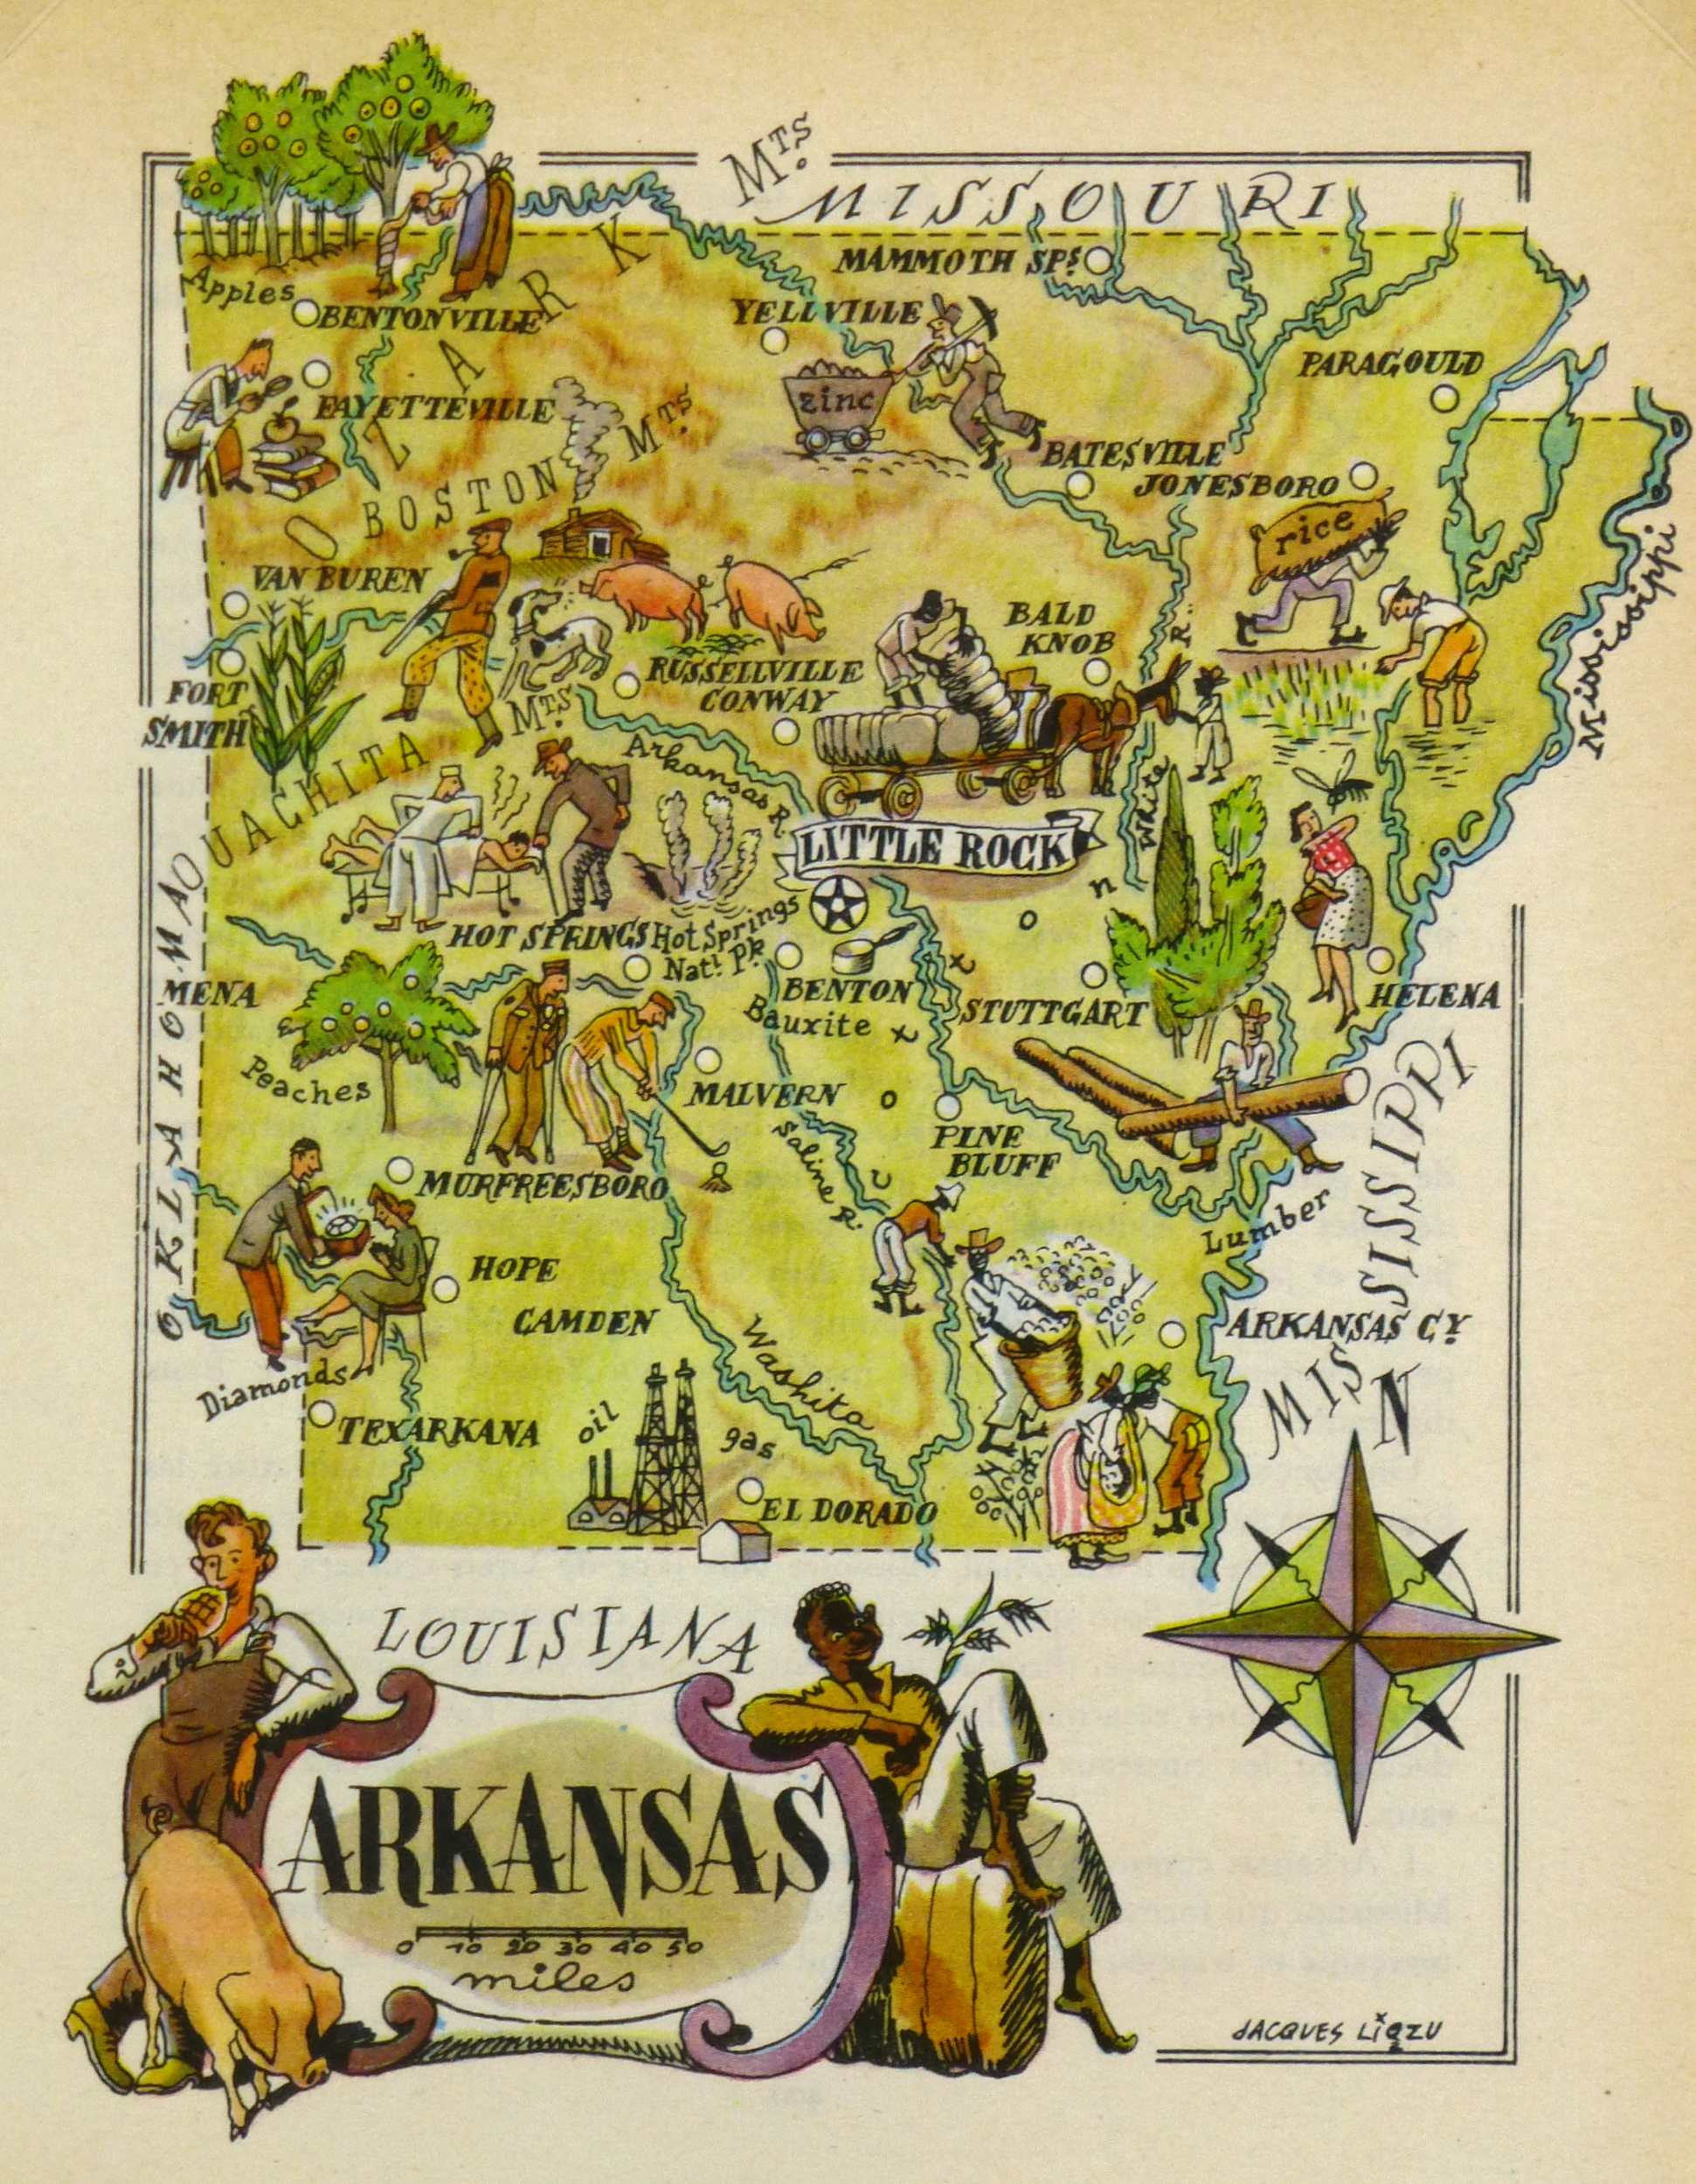 Arkansas Pictorial Map 1946